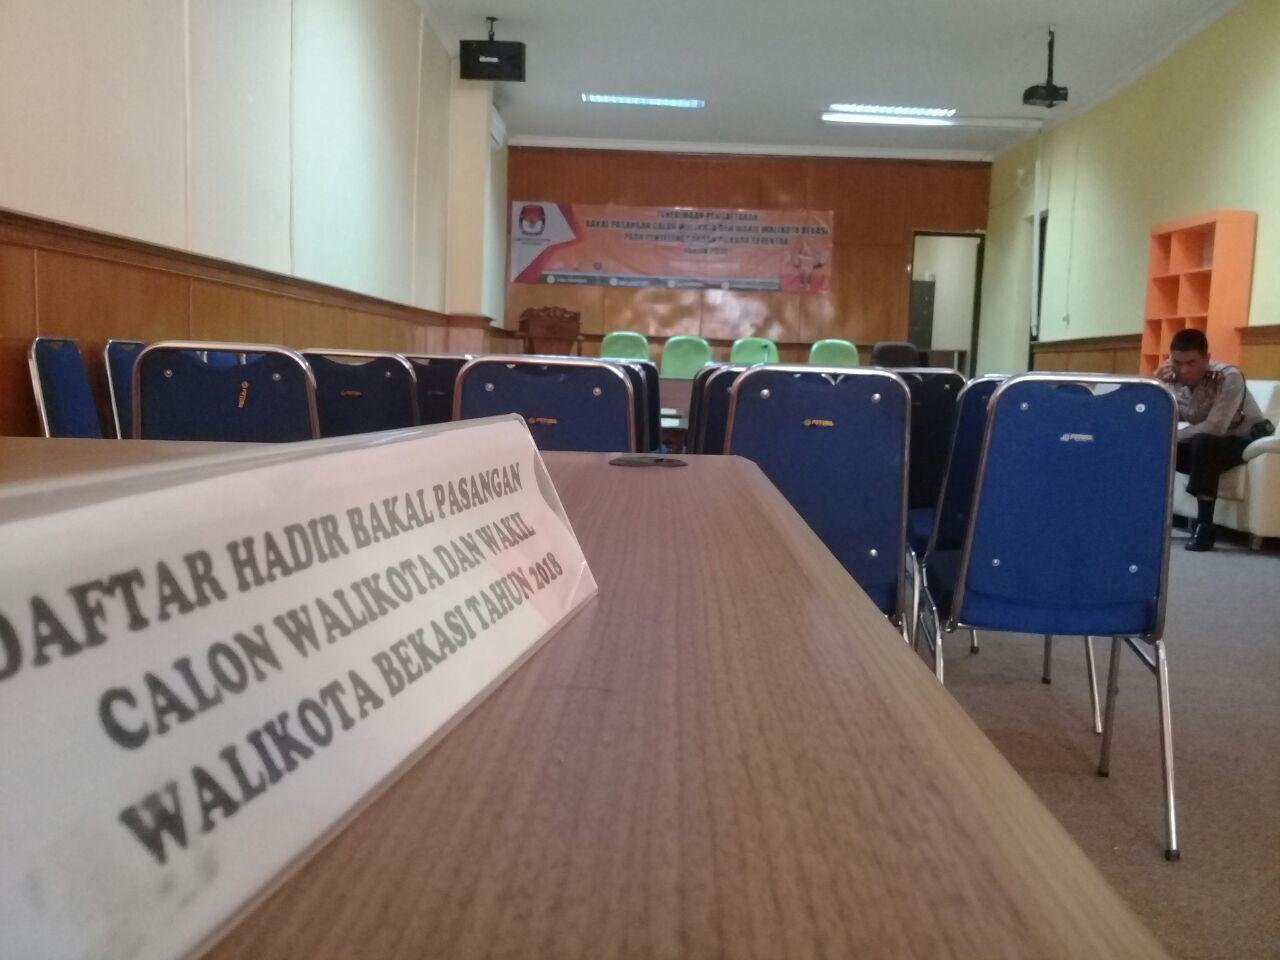 Hari Kedua, Pendaftaran Paslon Hingga Menjelang Siang KPU Kota Bekasi Masih Sepi